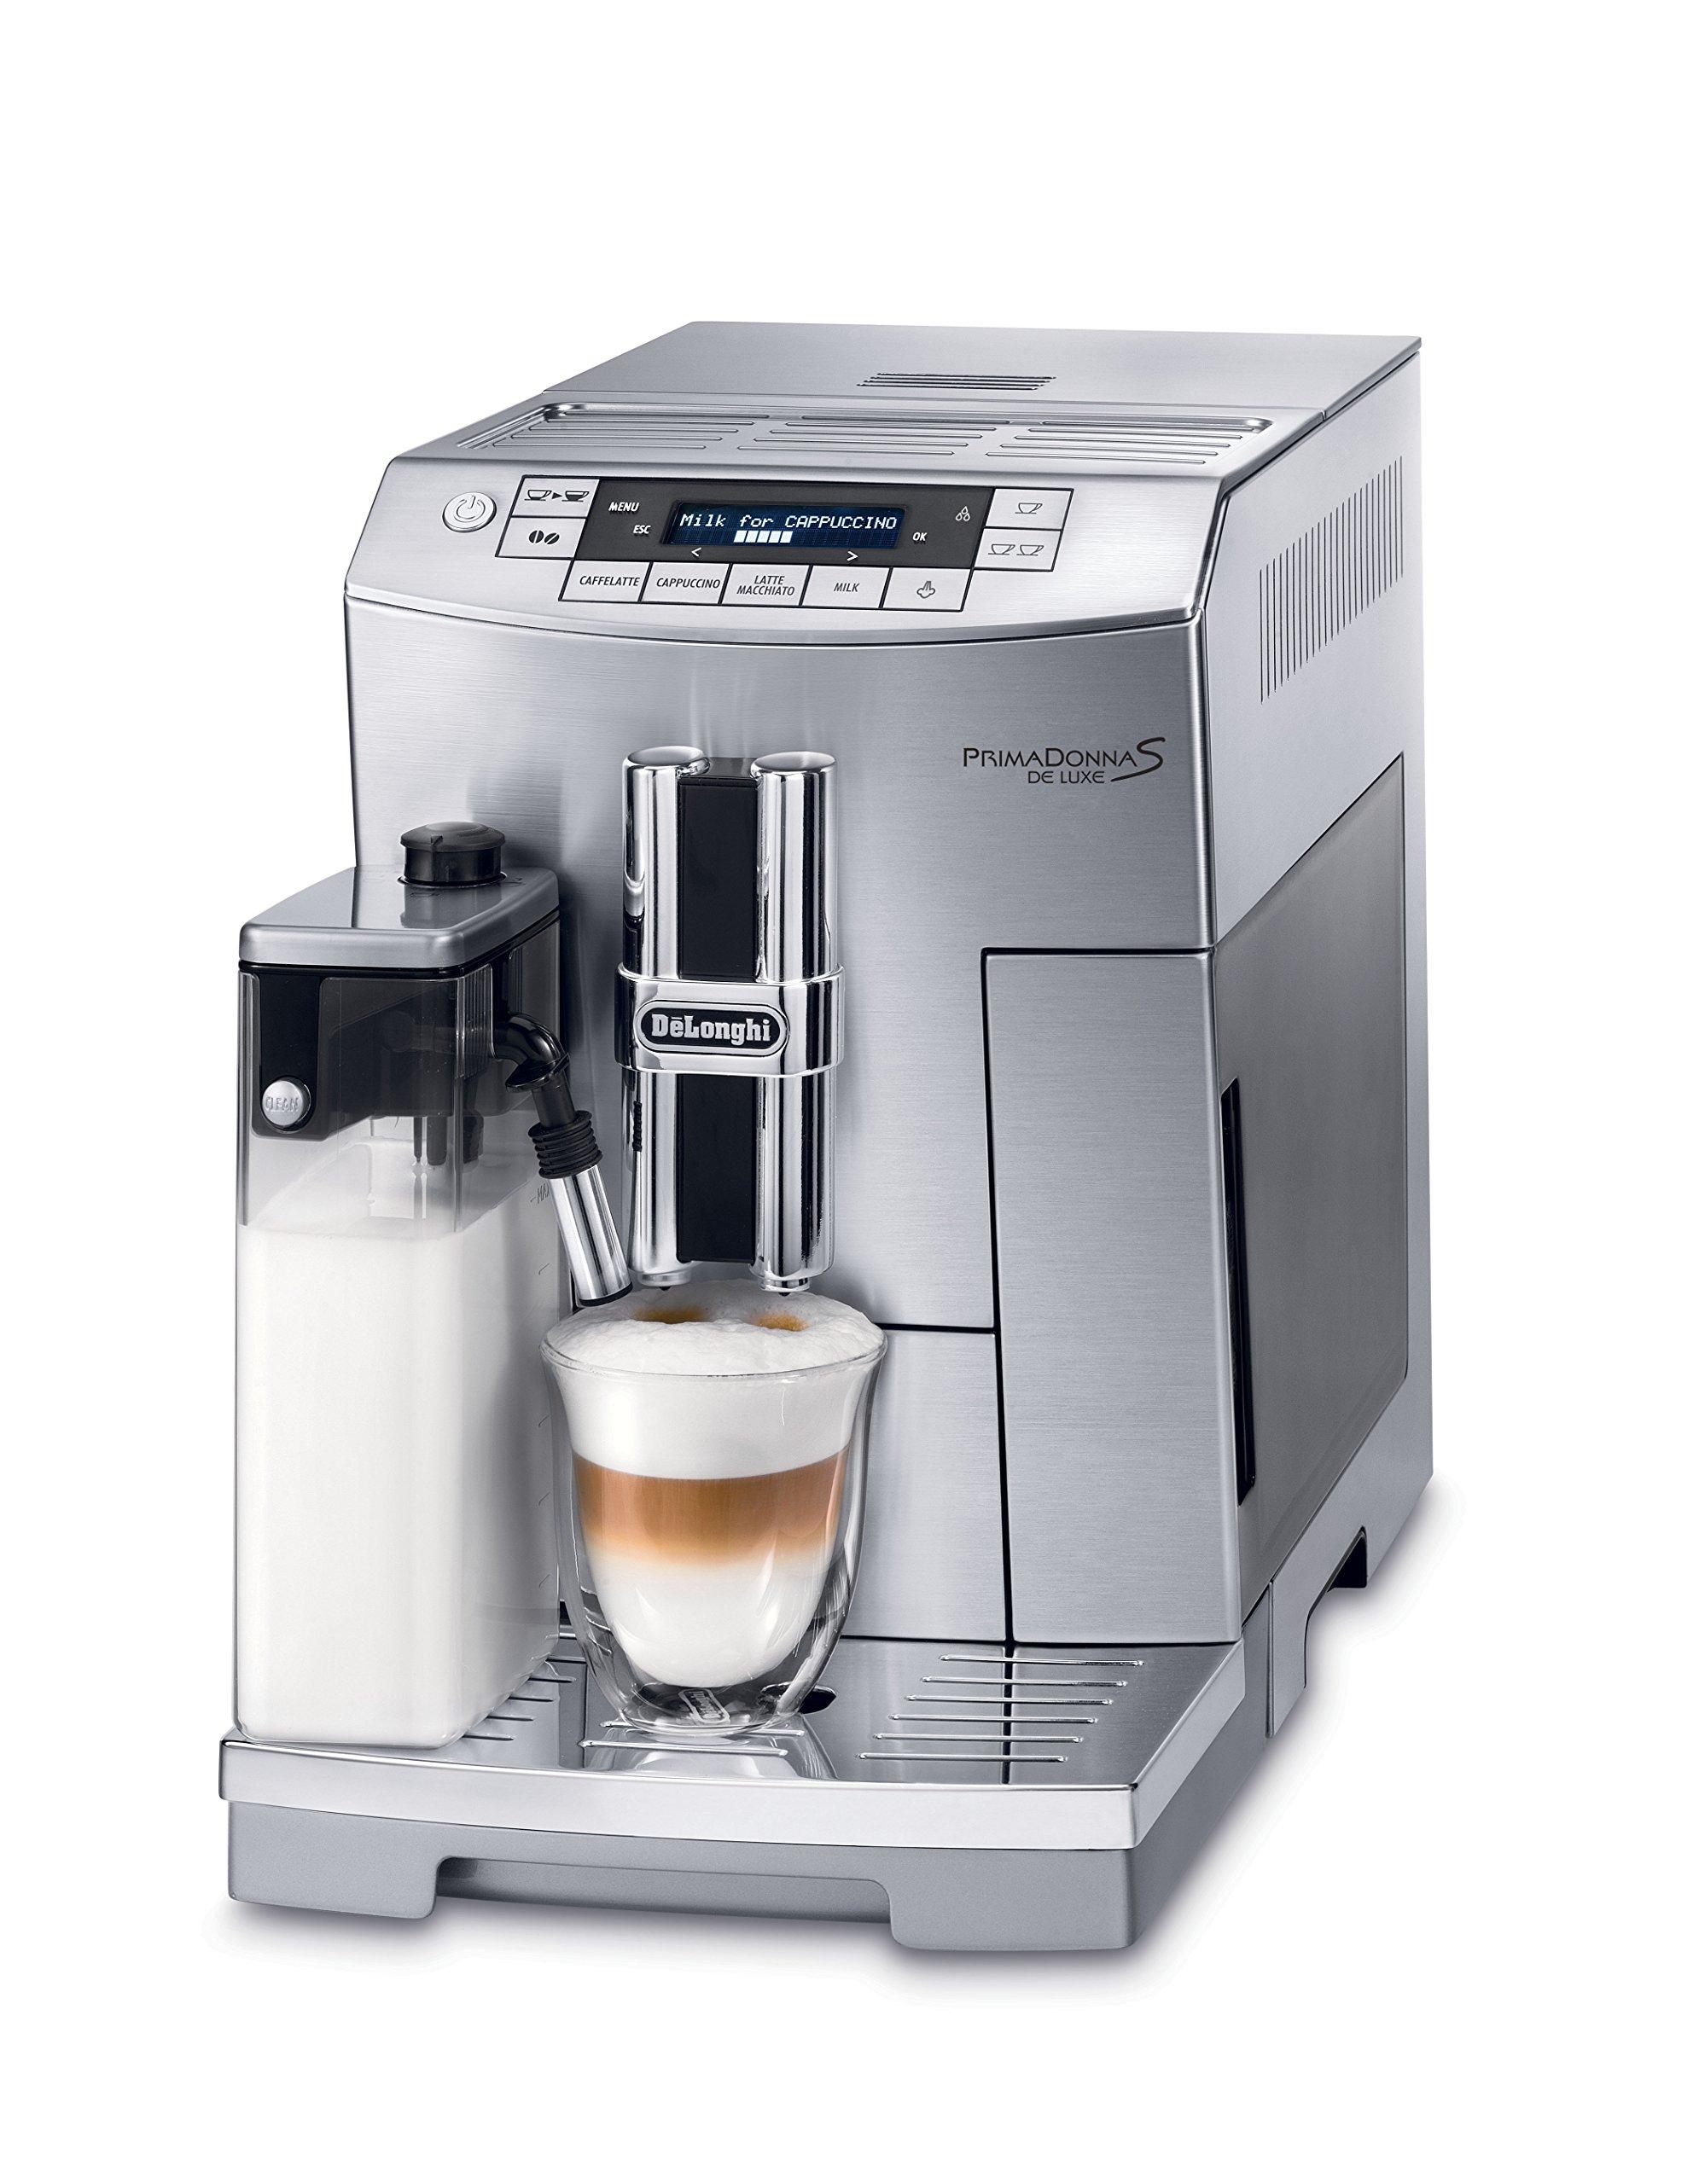 DeLonghi ECAM26455M Prima Donna S DeLuxe Super Automatic Espresso Machine (Certified Refurbished)